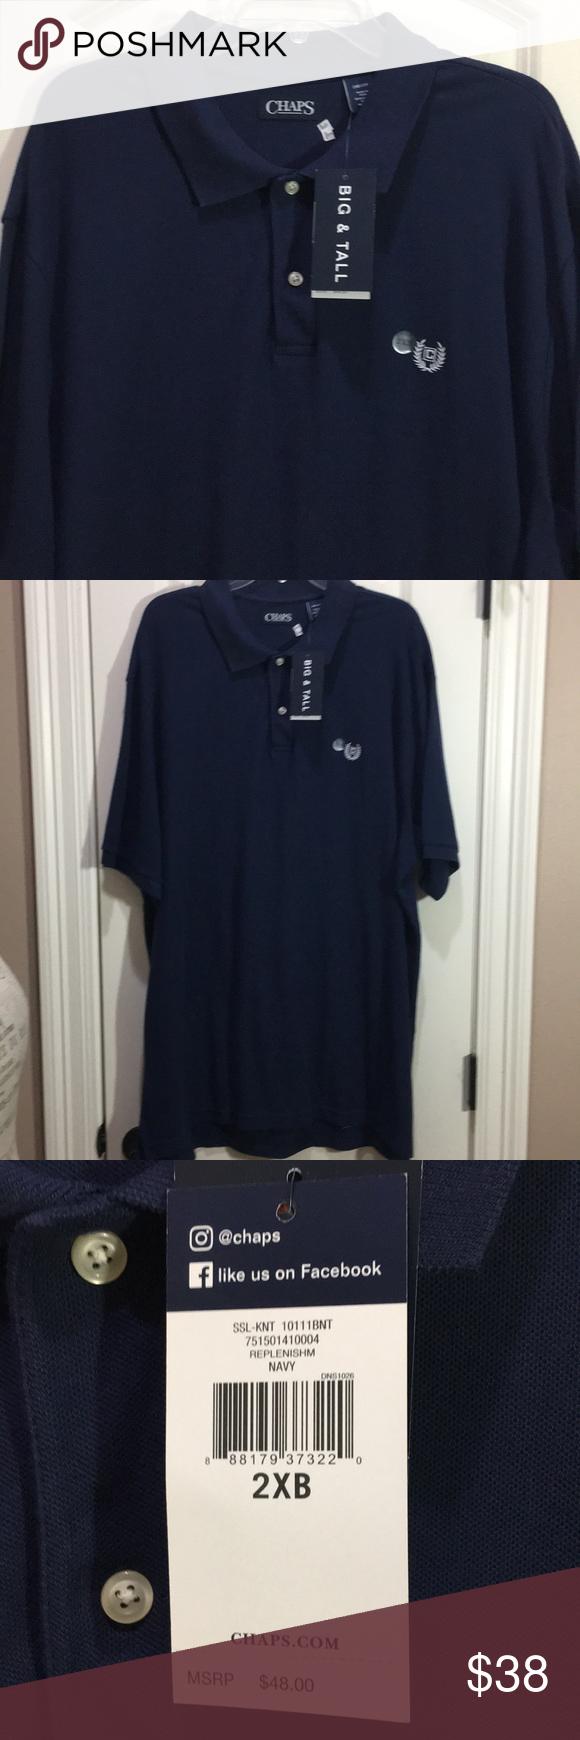 Chaps 2xb 2tf Navy Blue Polo Shirt W Tags Navy Blue Polo Shirts Blue Polo Shirts Shirts